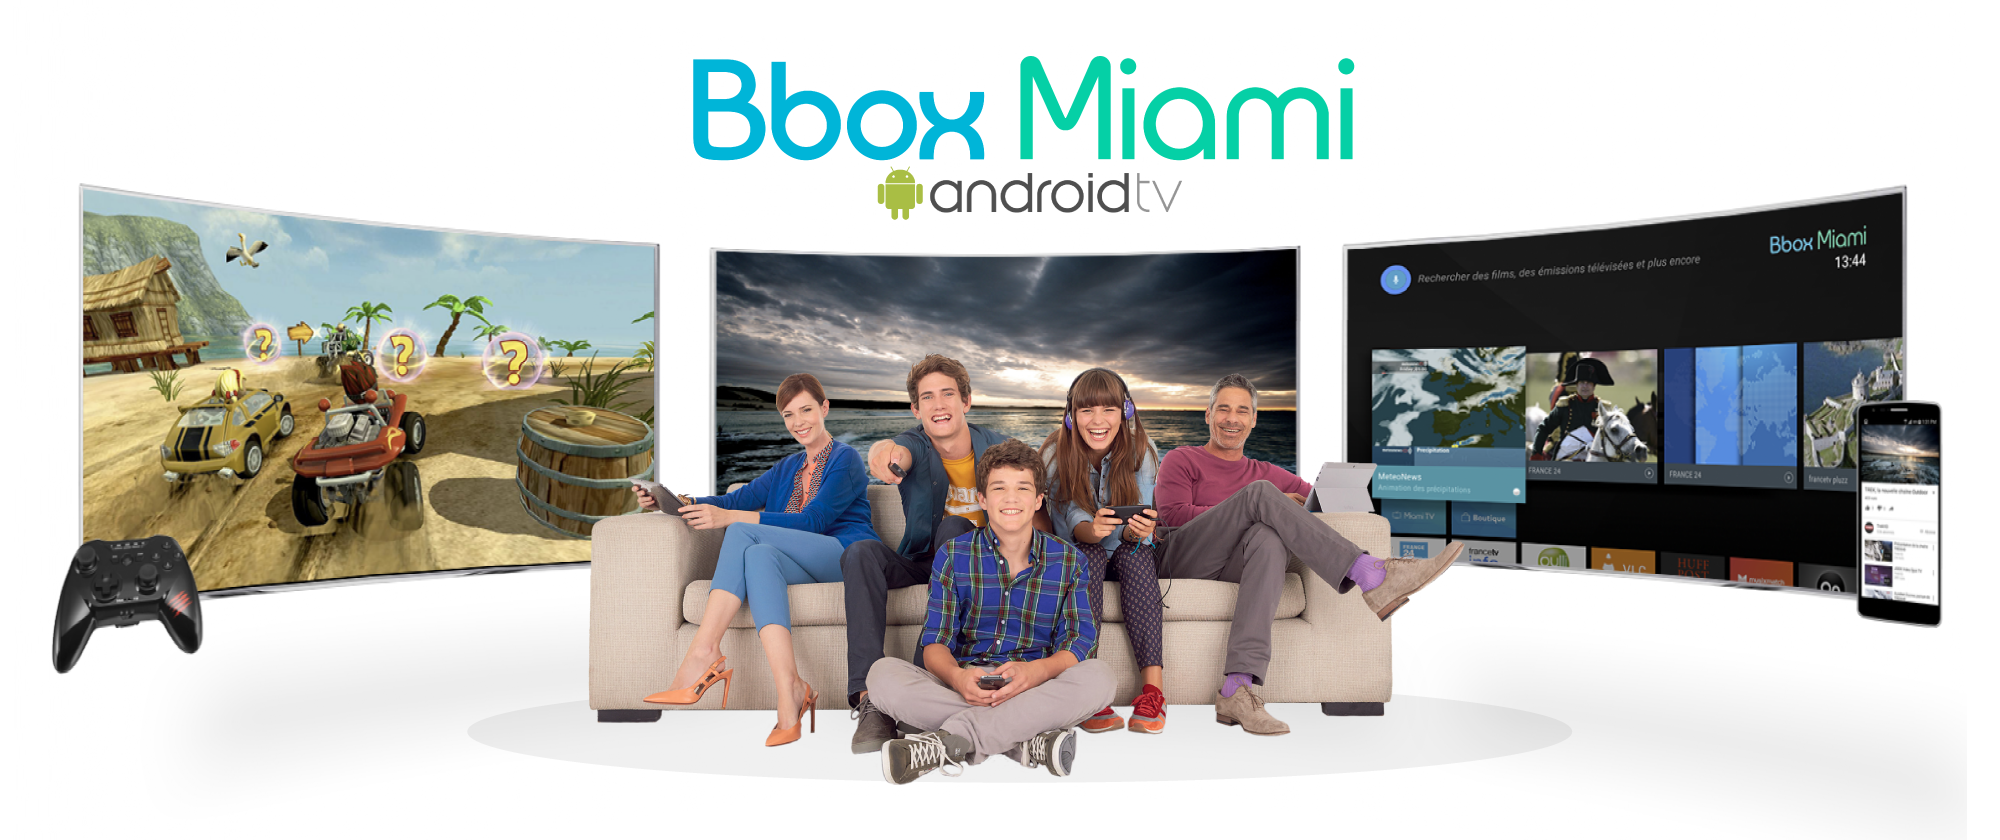 bbox miami le b ta test d 39 android tv enfin lanc pour 700 chanceux frandroid. Black Bedroom Furniture Sets. Home Design Ideas